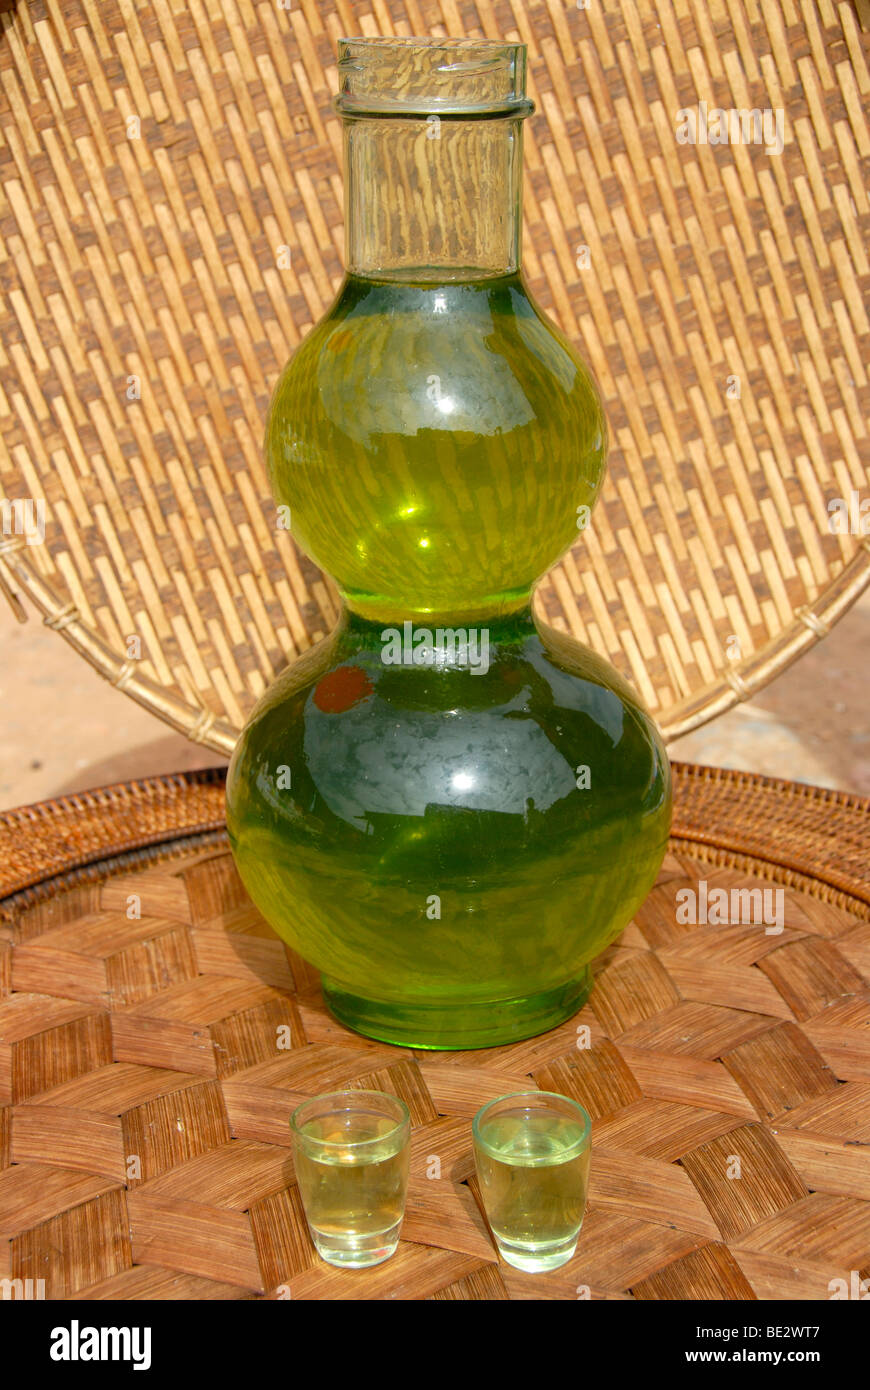 Green Lao Lao, bulbous glass bottle filled with alcohol, Laotian rice liquor, Phongsali, Phongsali province, Laos, - Stock Image